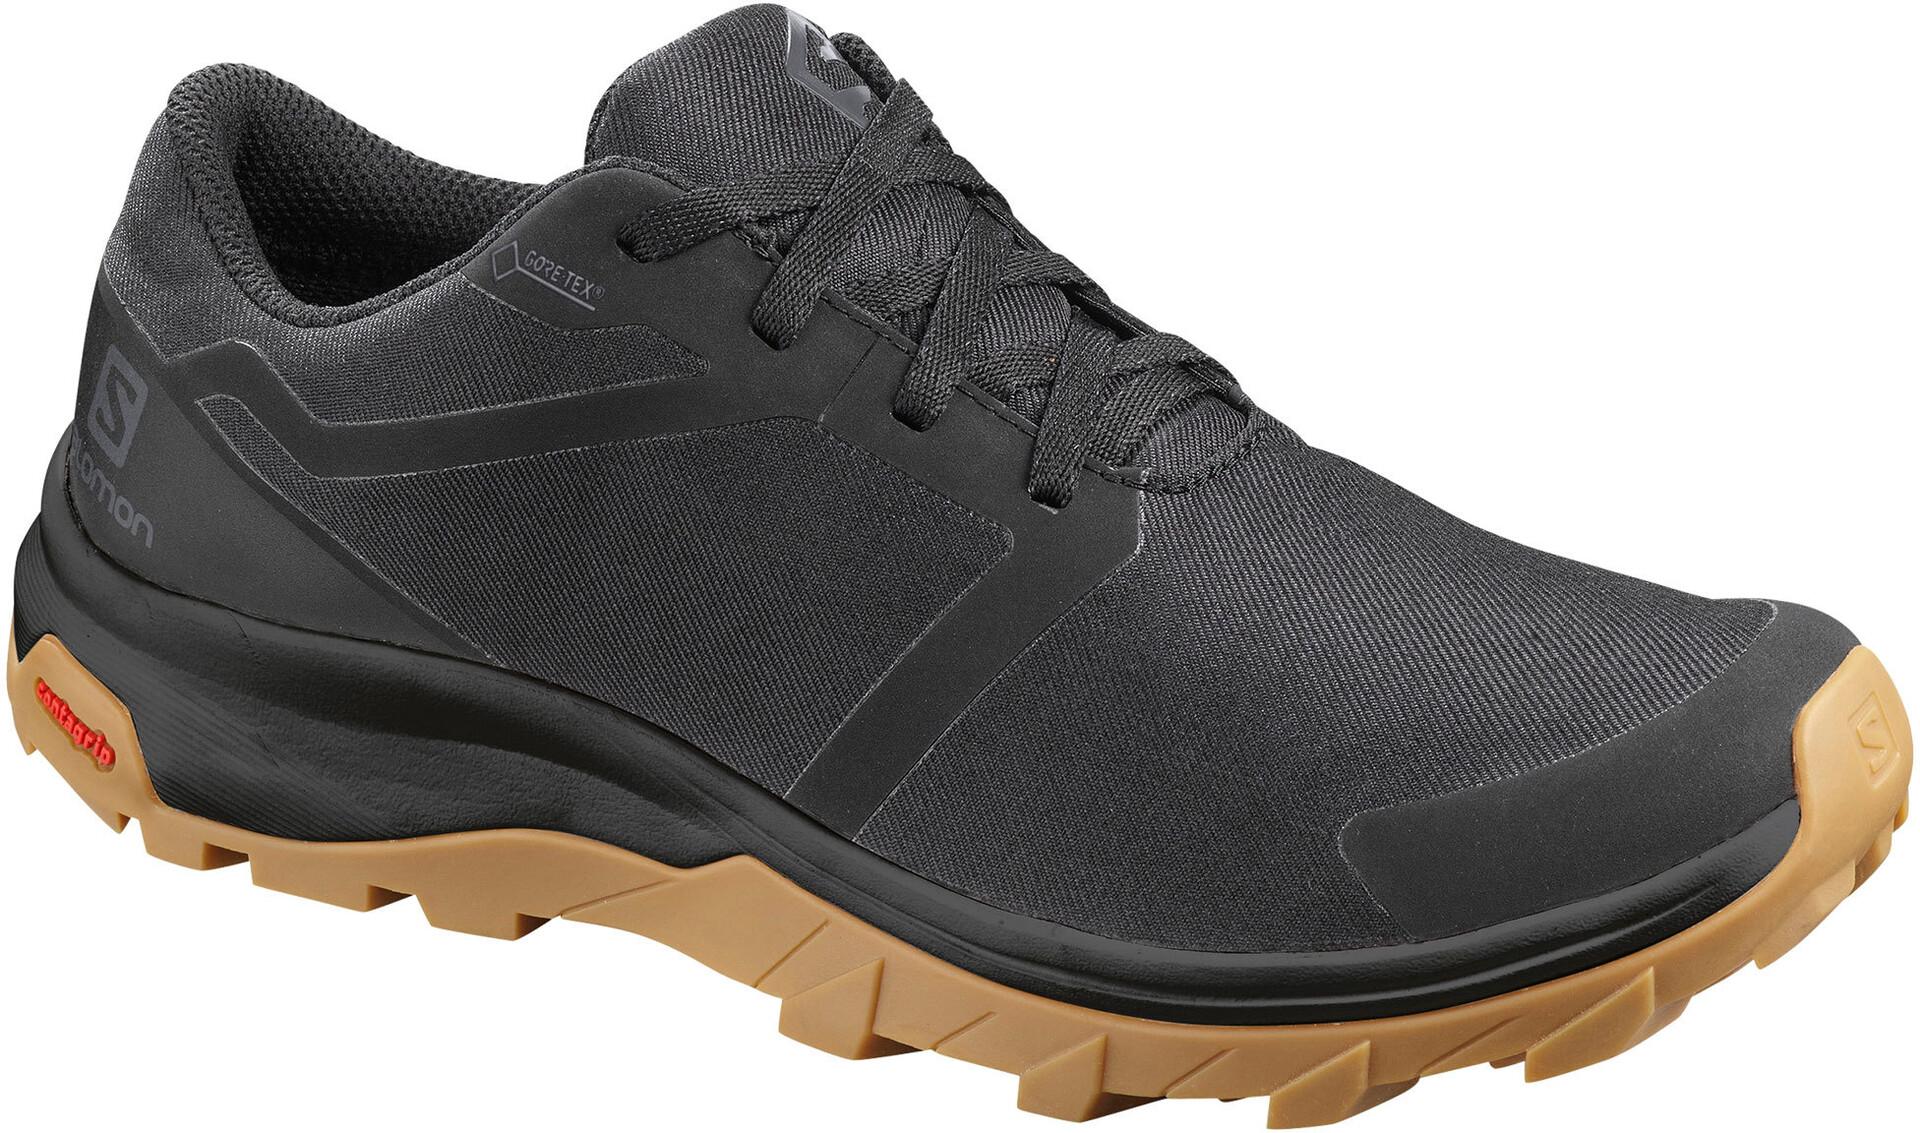 Salomon Outbound GTX Schuhe Damen blackblackgum1a | campz.at